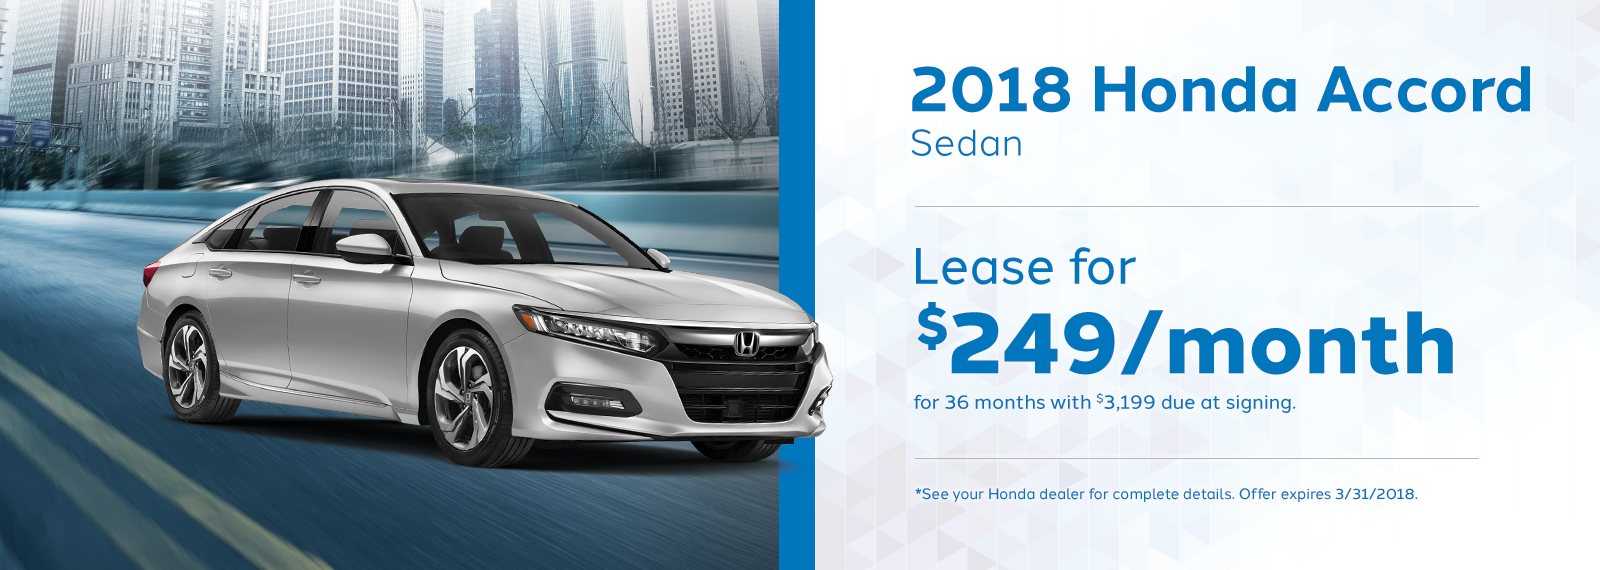 Accord Sedan March Offer Genthe Honda Homepage